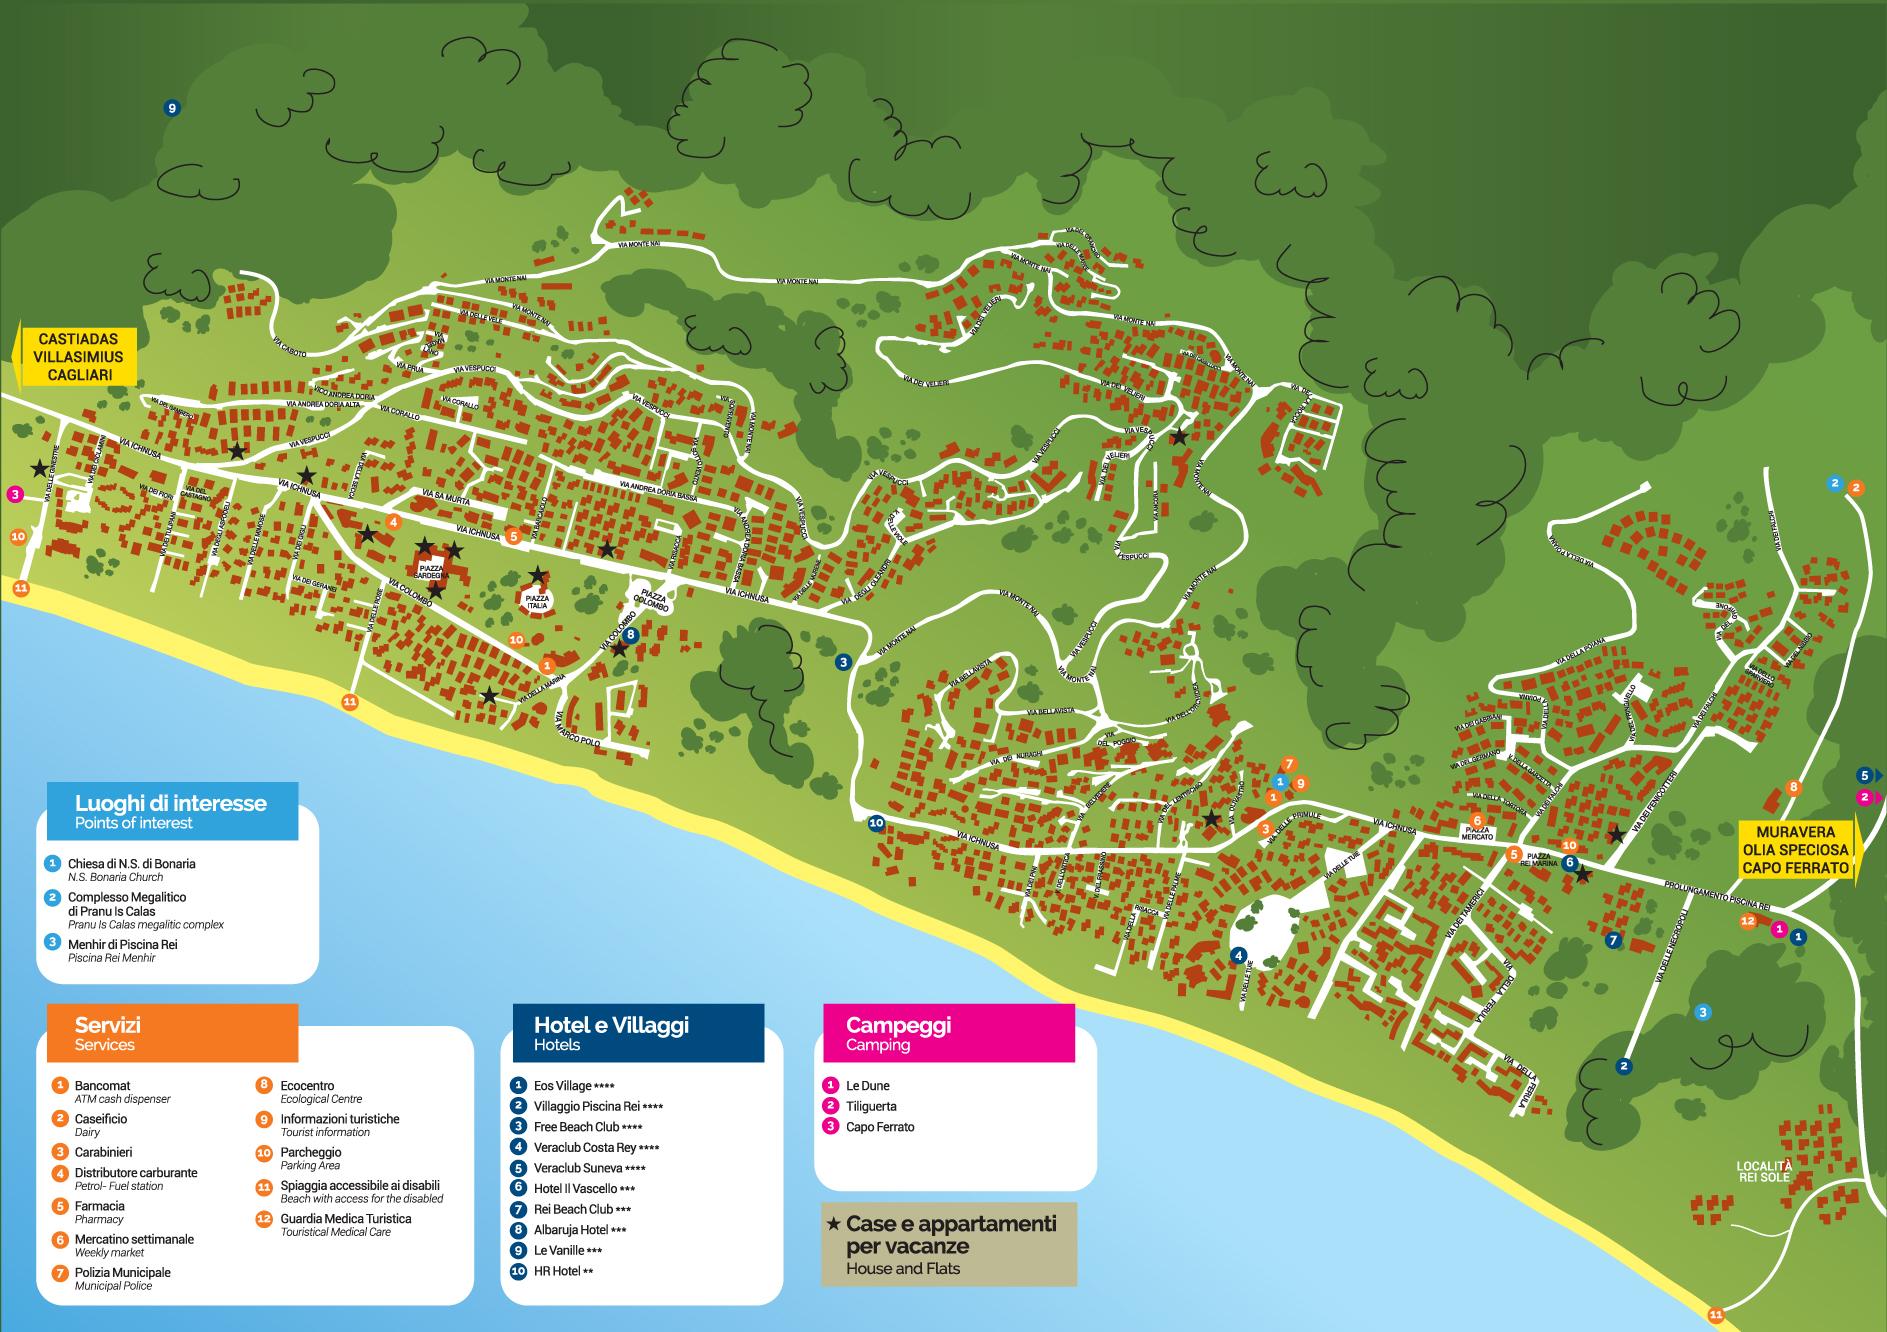 Cartina Sardegna Con Hotel.Cartina Costa Rei Costa Rei Sardegna Sud Est